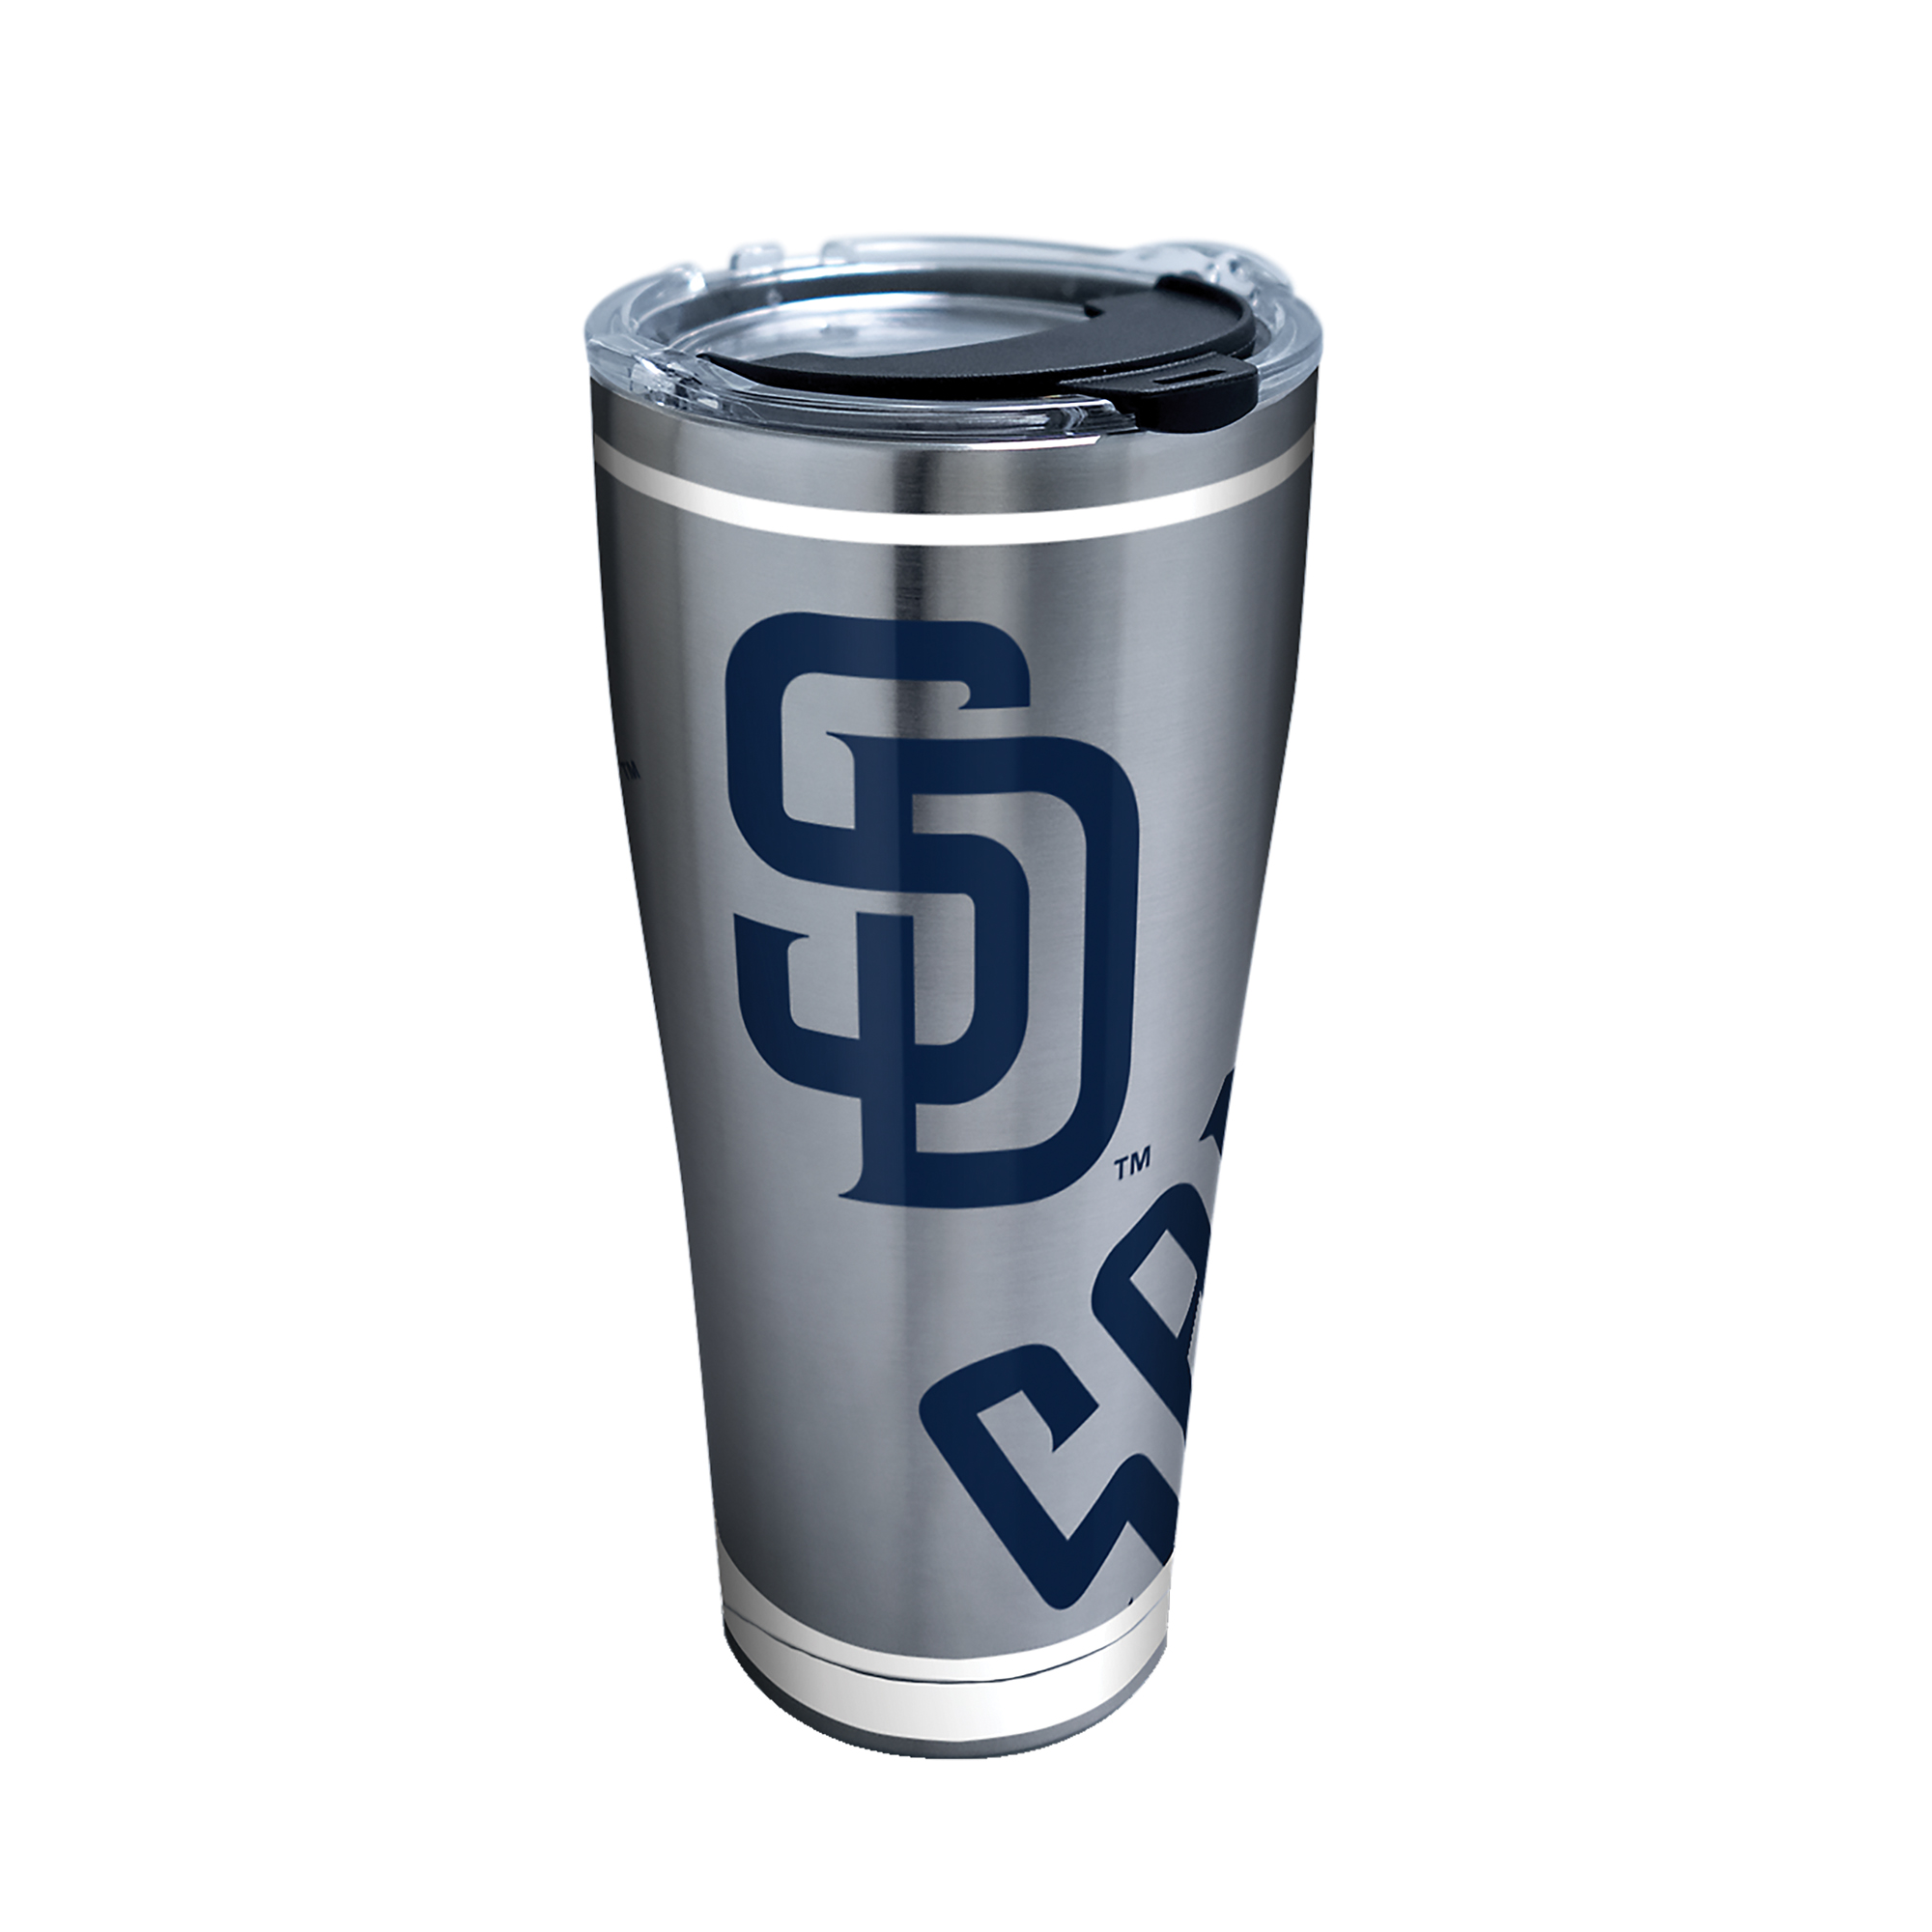 MLB San Diego Padres Genuine 30 oz Stainless Steel Tumbler with lid